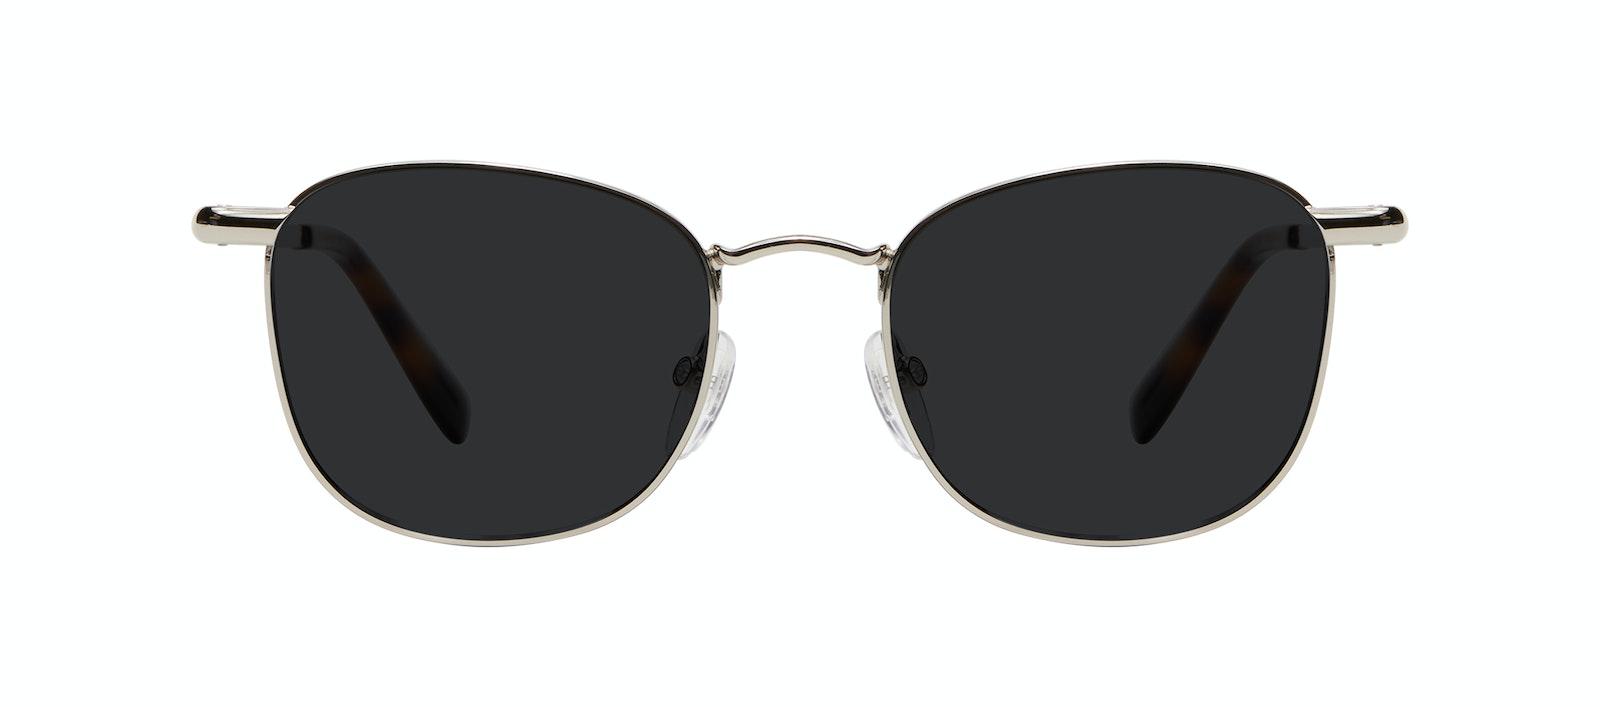 Affordable Fashion Glasses Square Sunglasses Men Women Apex S Silver Front